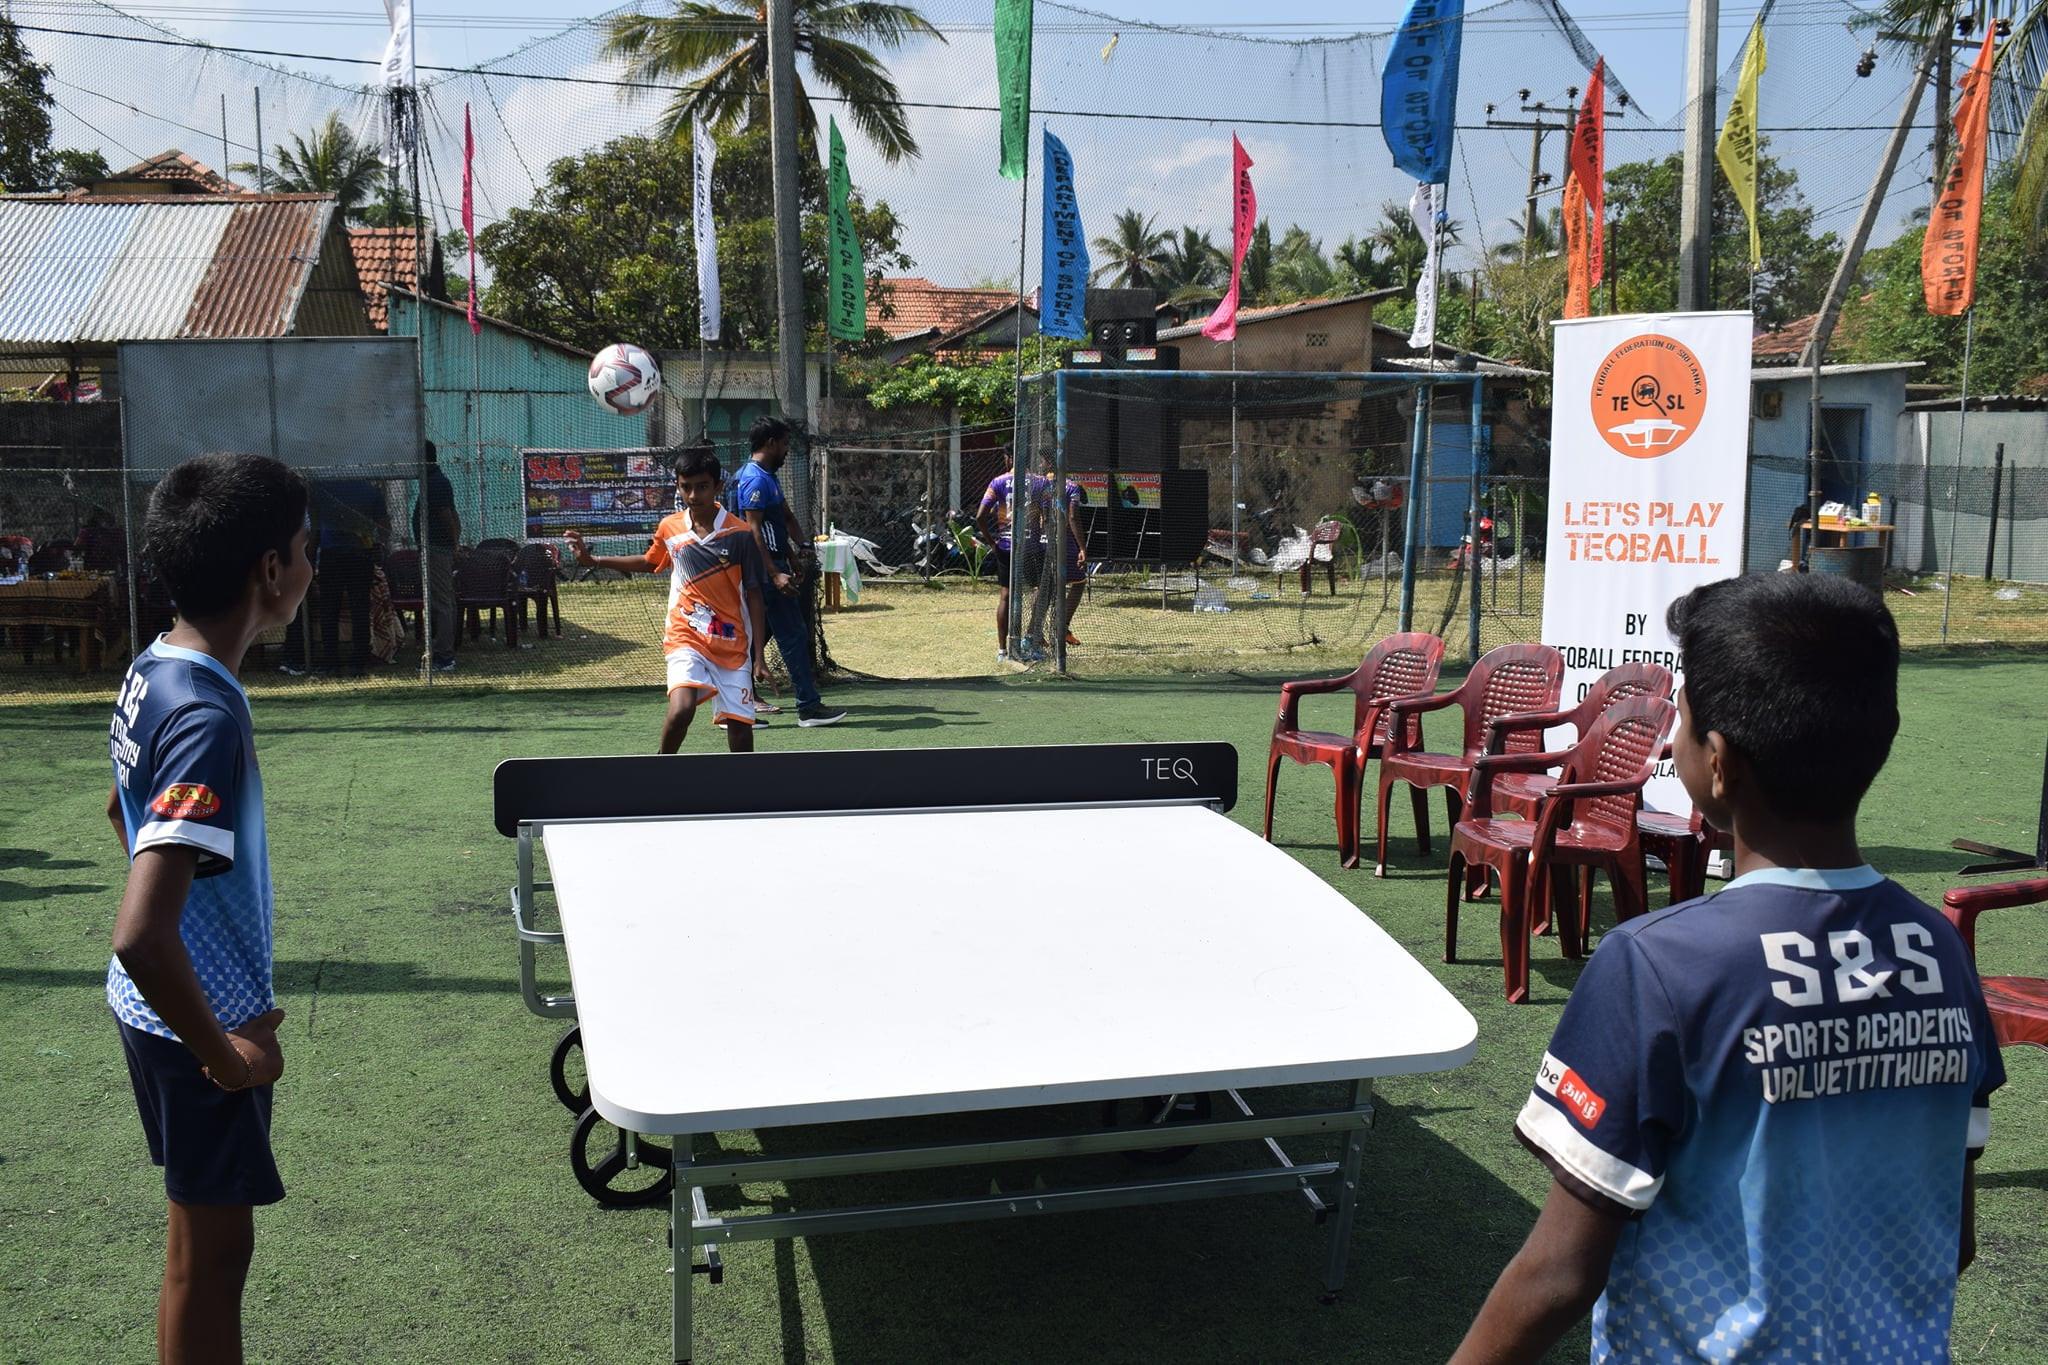 Sri Lanka Teqball Federation to focus on creating positive change through sport